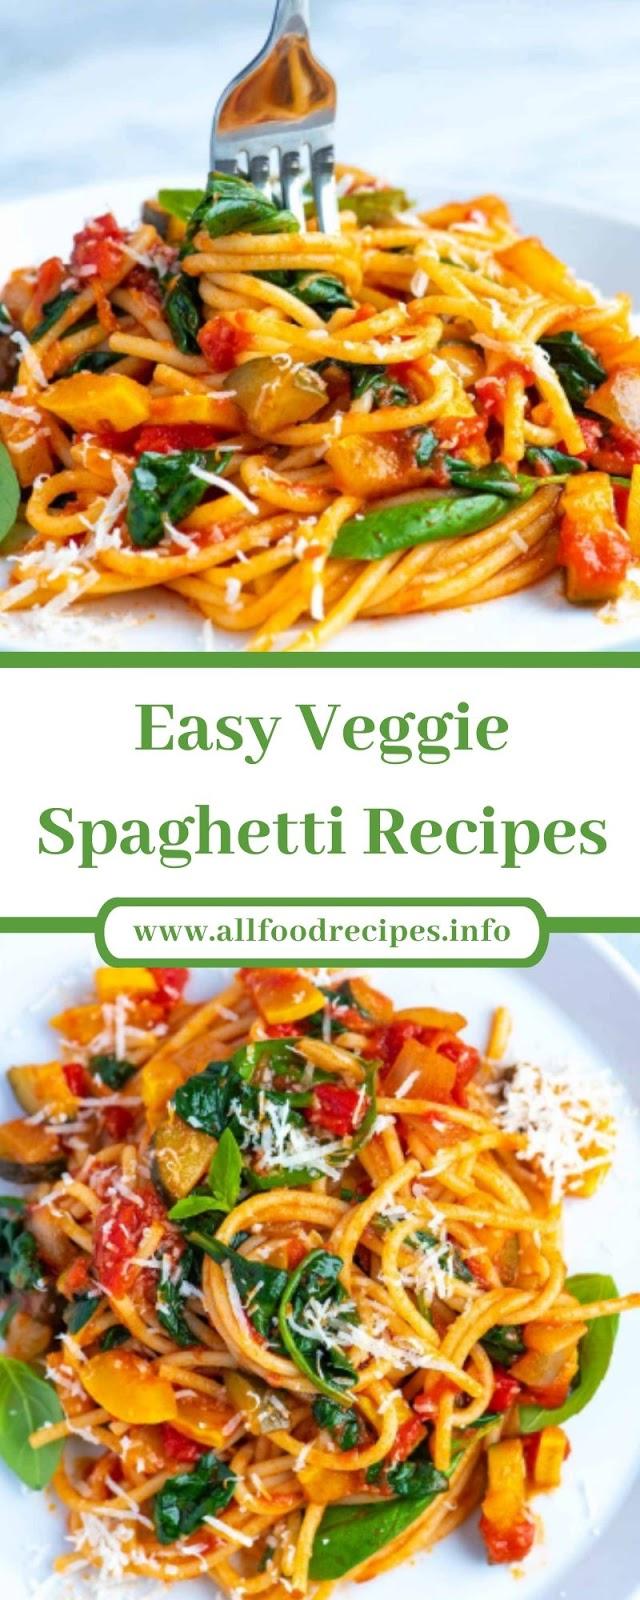 Easy Veggie Spaghetti Recipes